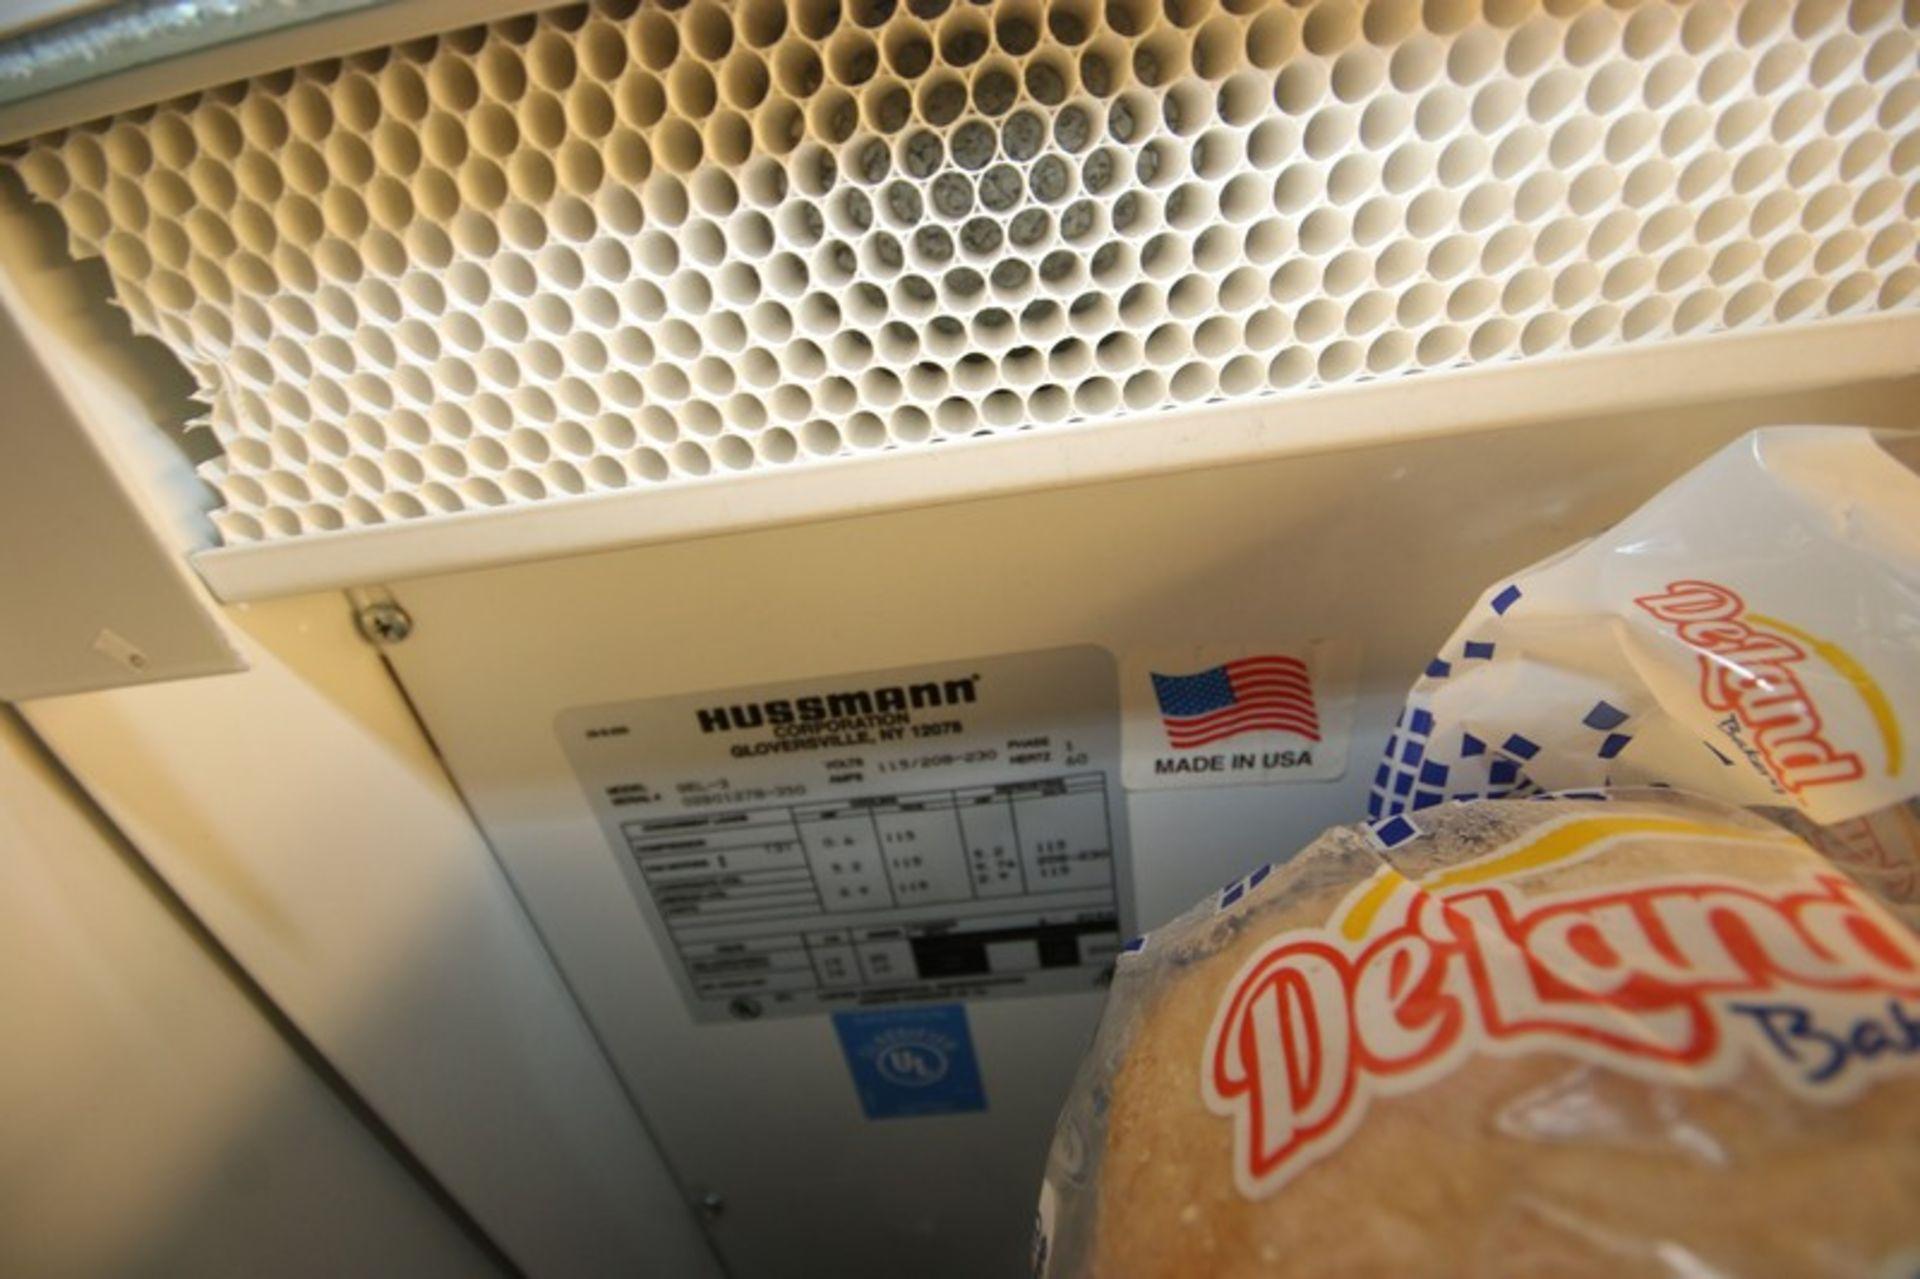 Hussman 3-Door Refrigeration Unit, M/N GEL-3, S/N 02BO1278-350, 115/208-230 Volts, 1 Phase, - Image 4 of 4